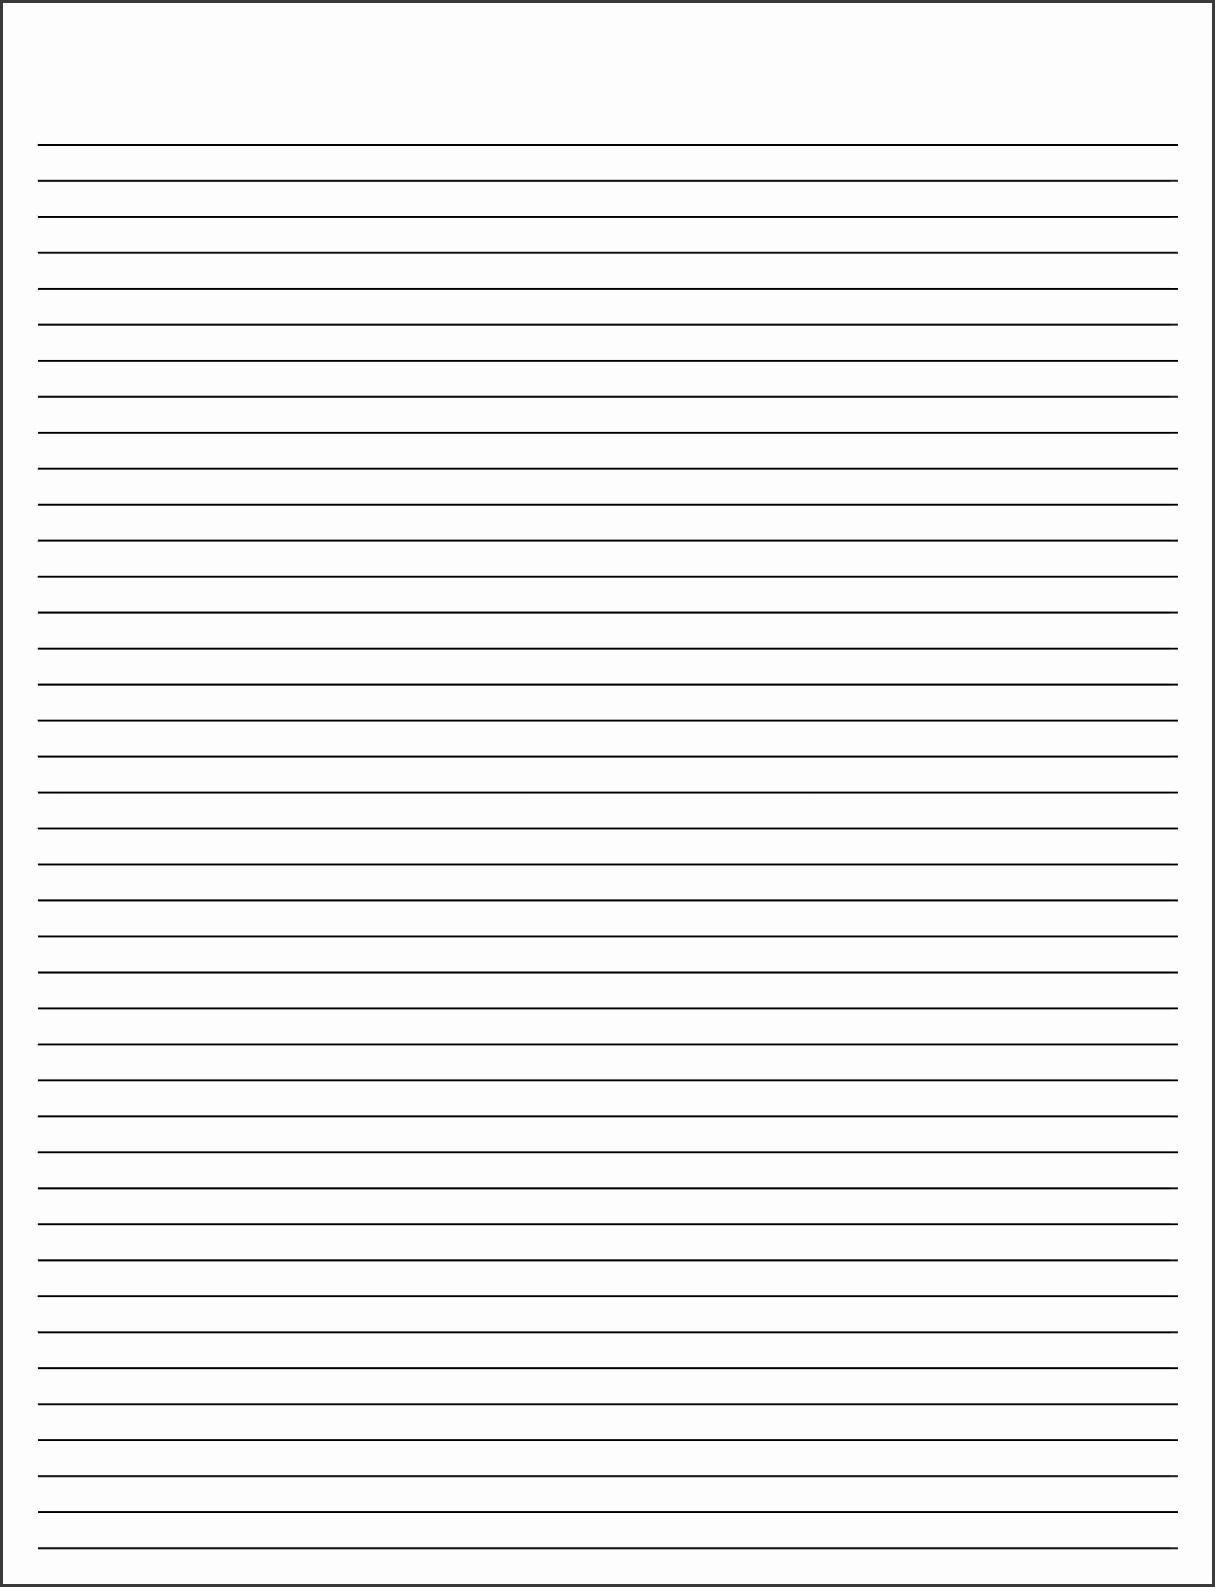 Printable Lined Paper Printable Lined Paper 03